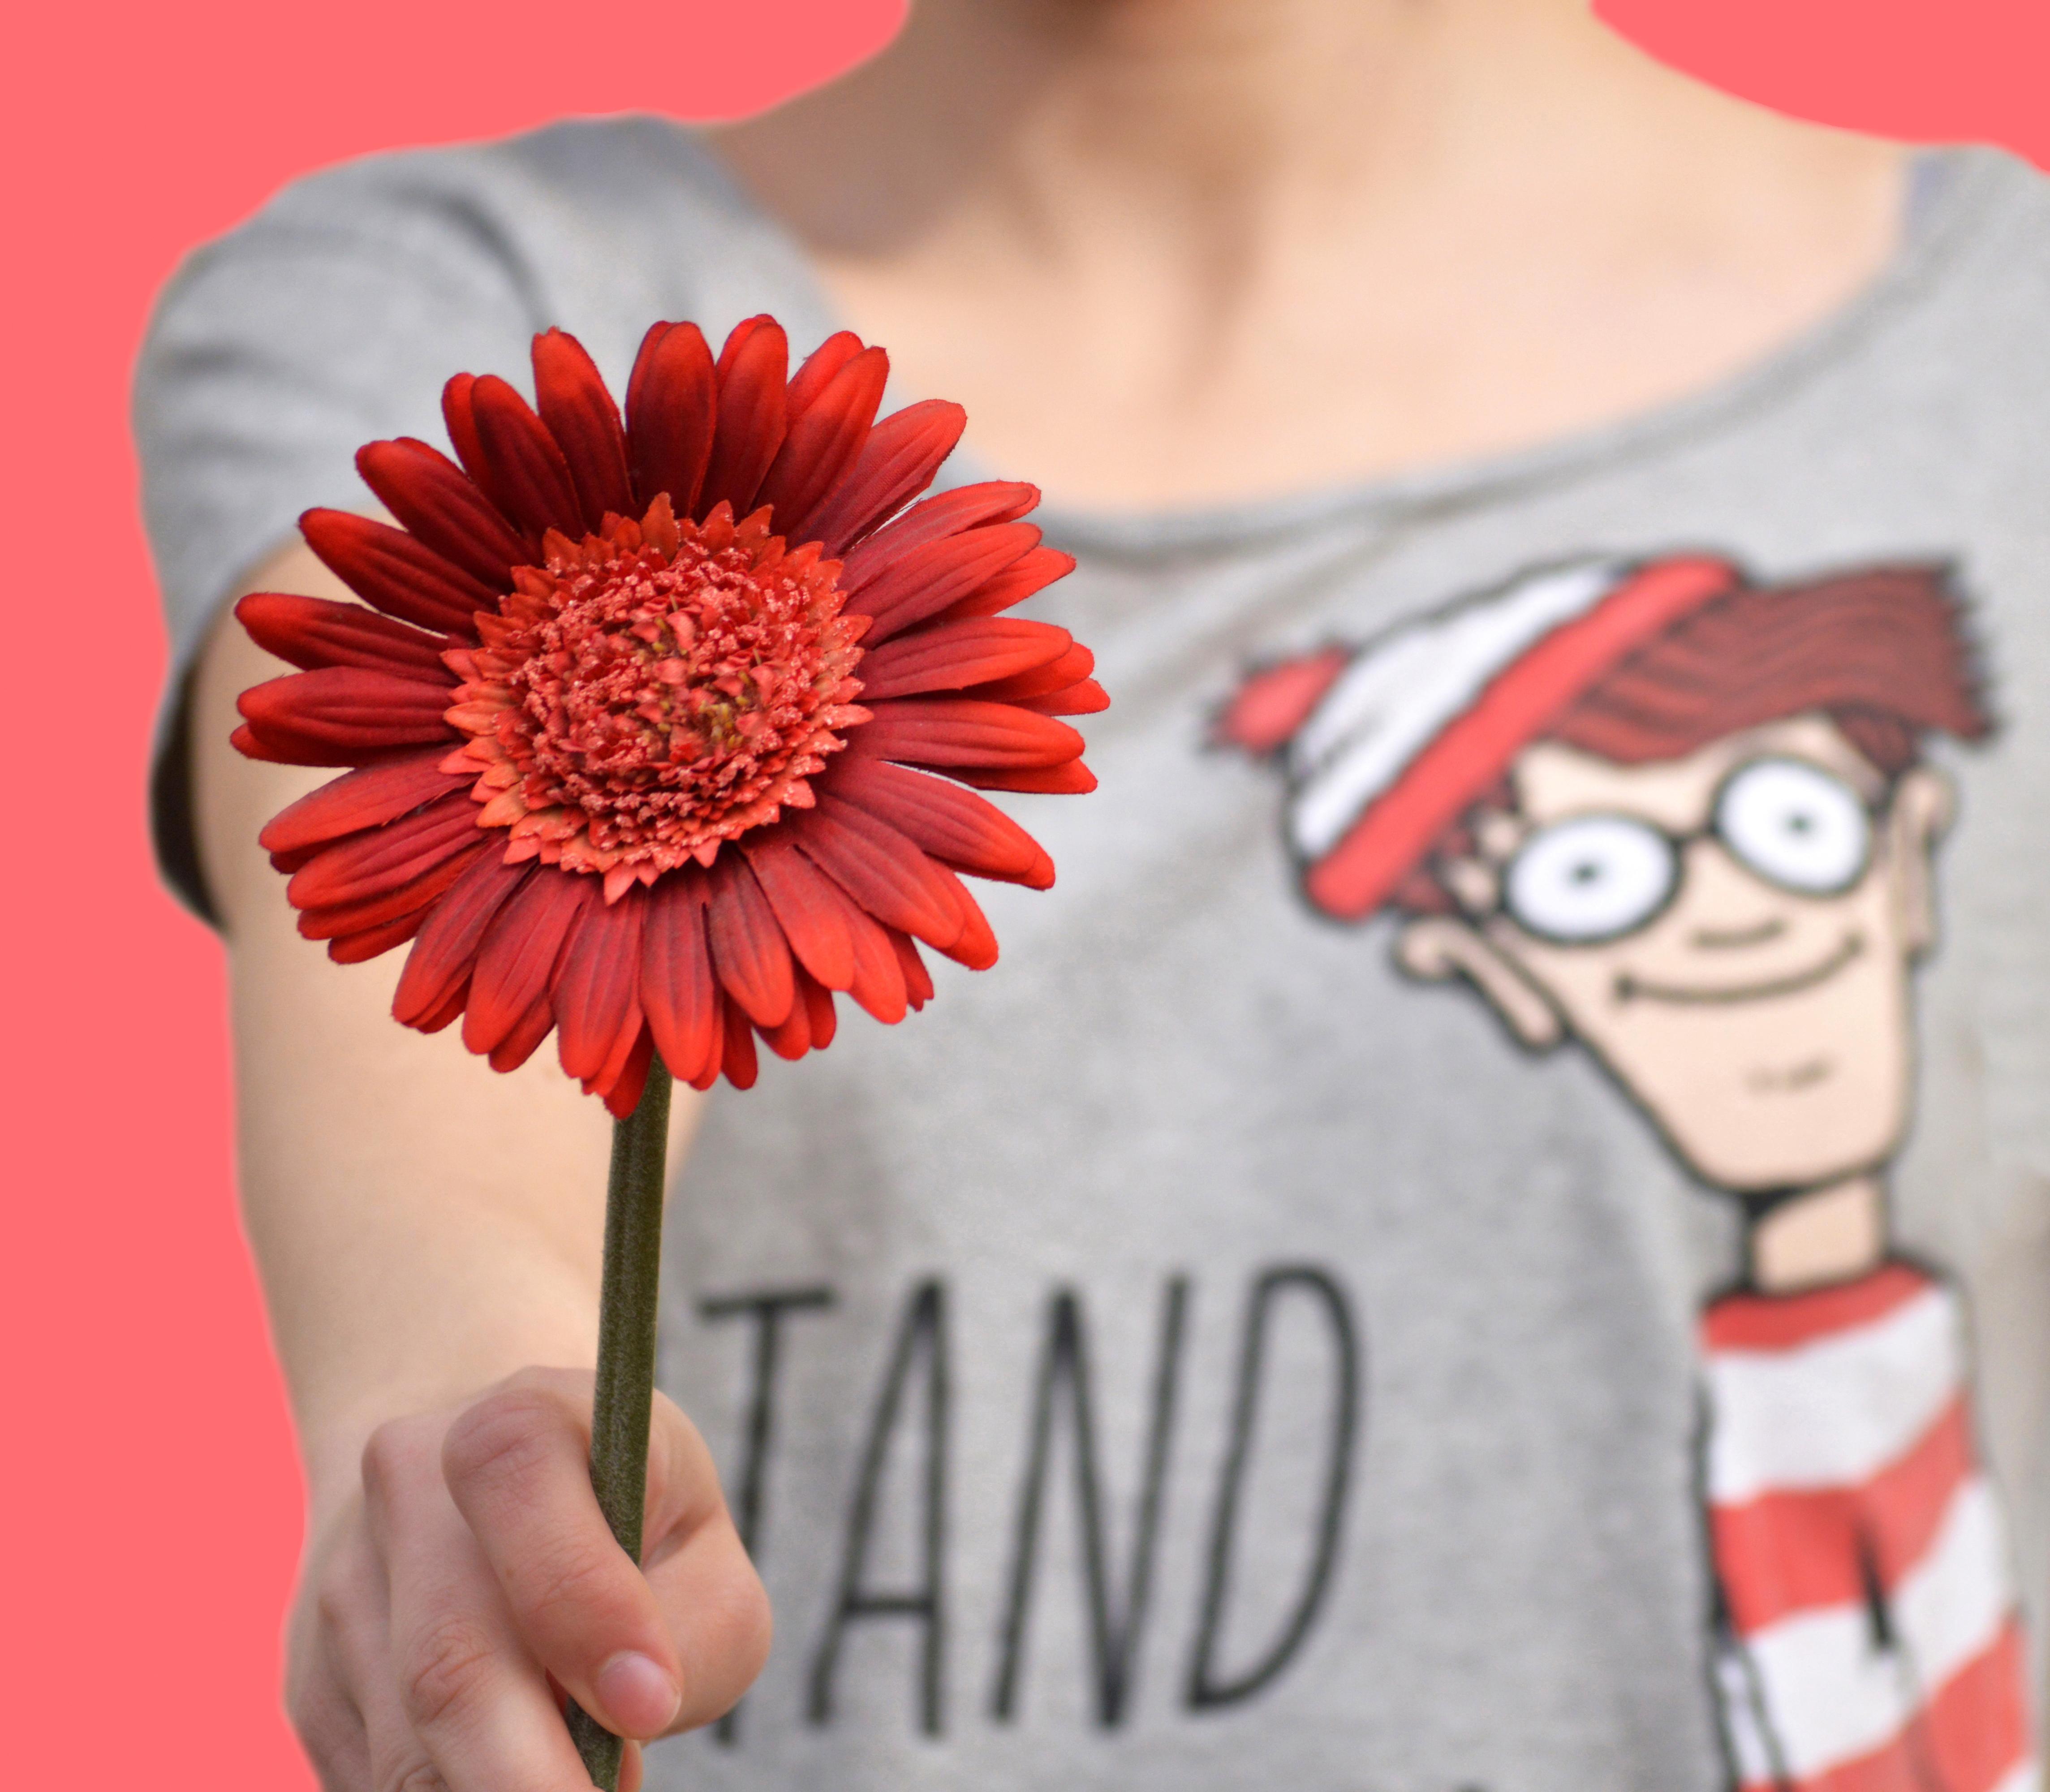 Free Images Flower Petal Spring Red Tshirt Pink Rot Fleur